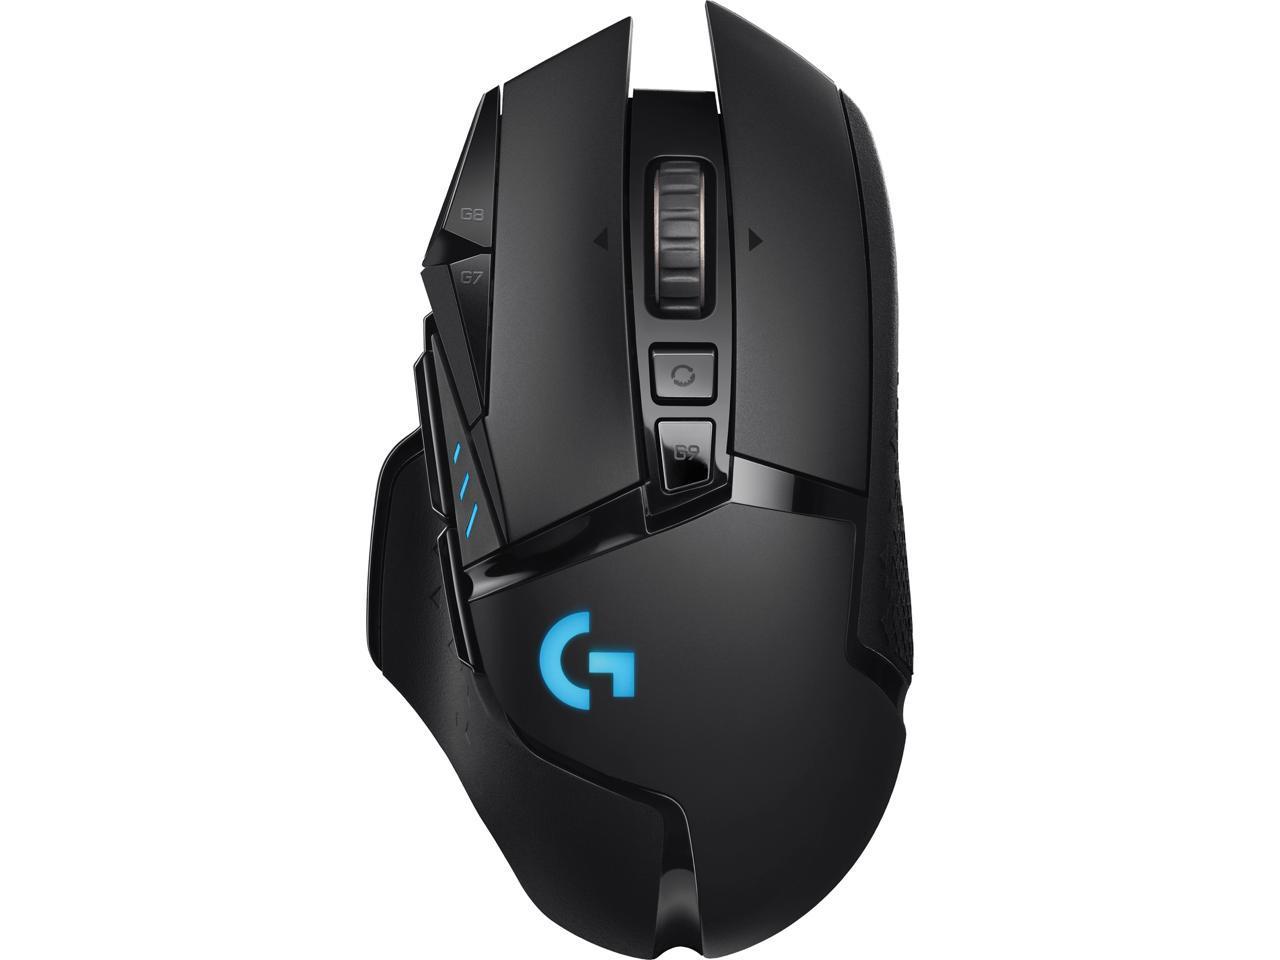 Logitech G703 Black LightSpeed Gaming Mouse No weight